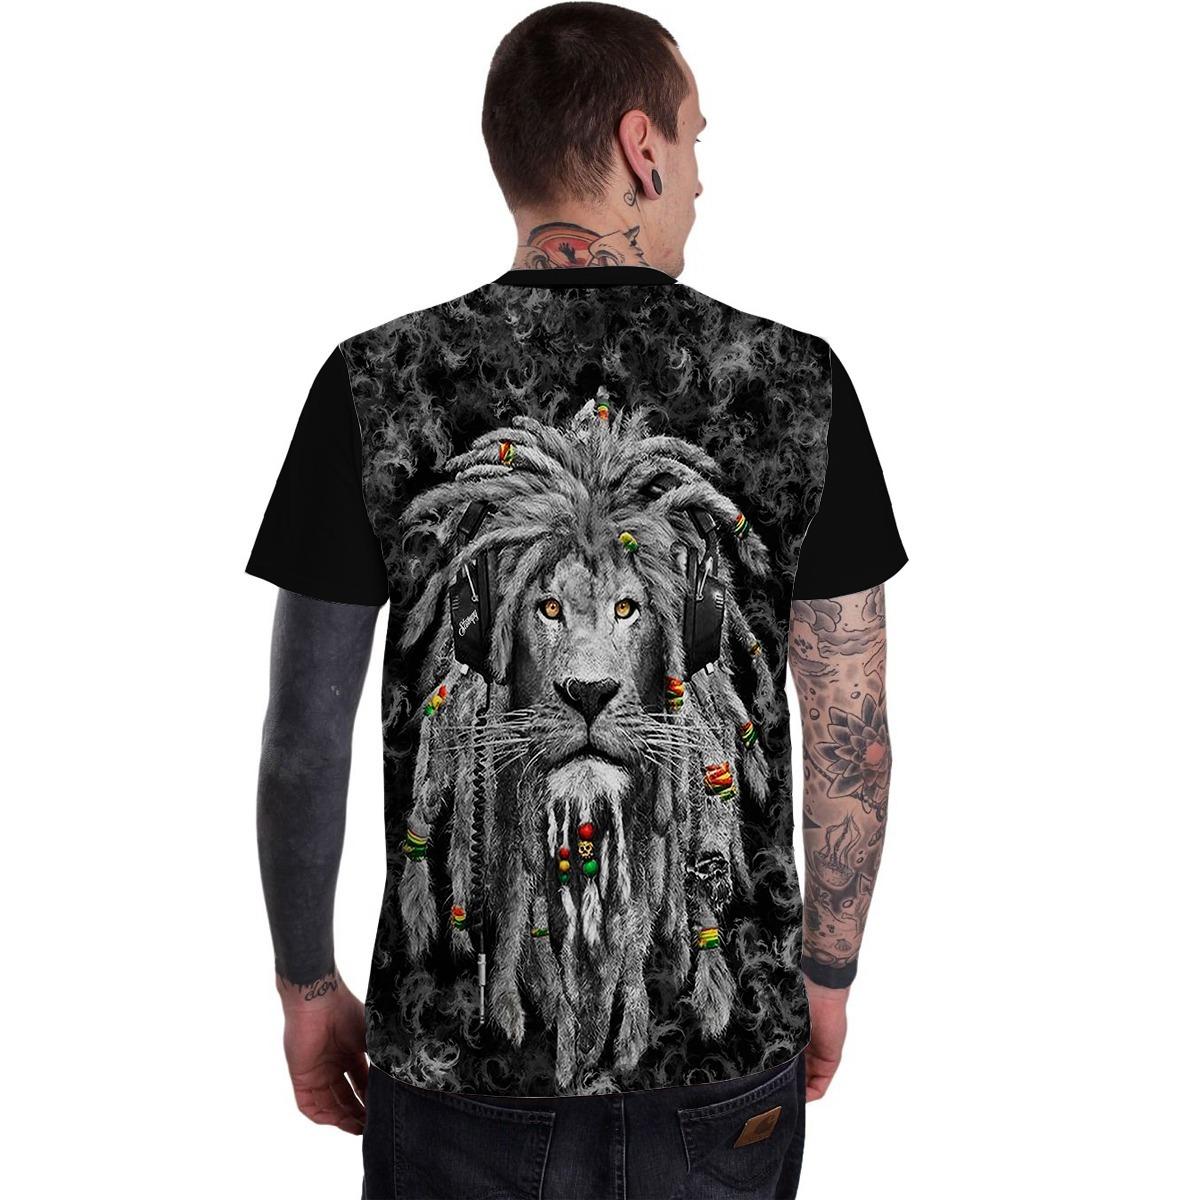 Stompy Camisetas Costas Lion Reggae Rasta Tattoo Tatuagem